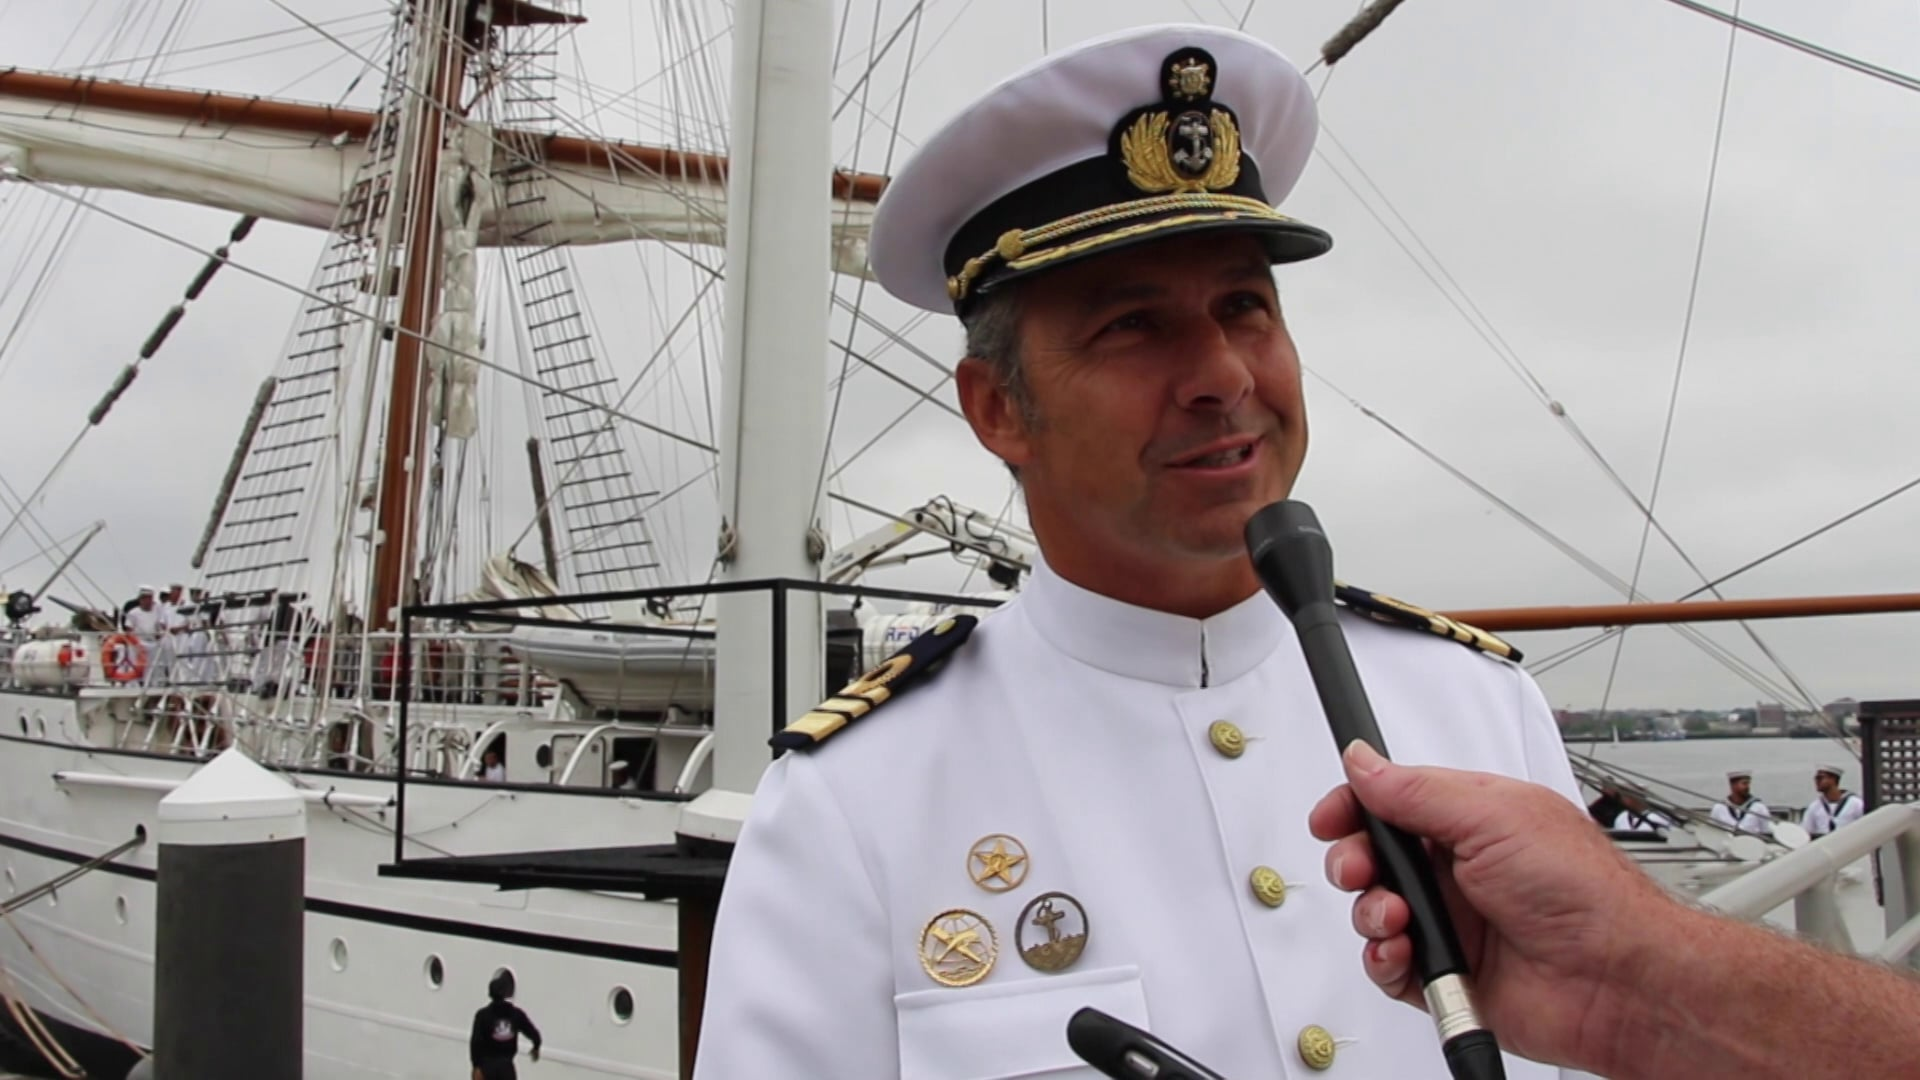 Tall Ship NRP Sagres - Boston 2016